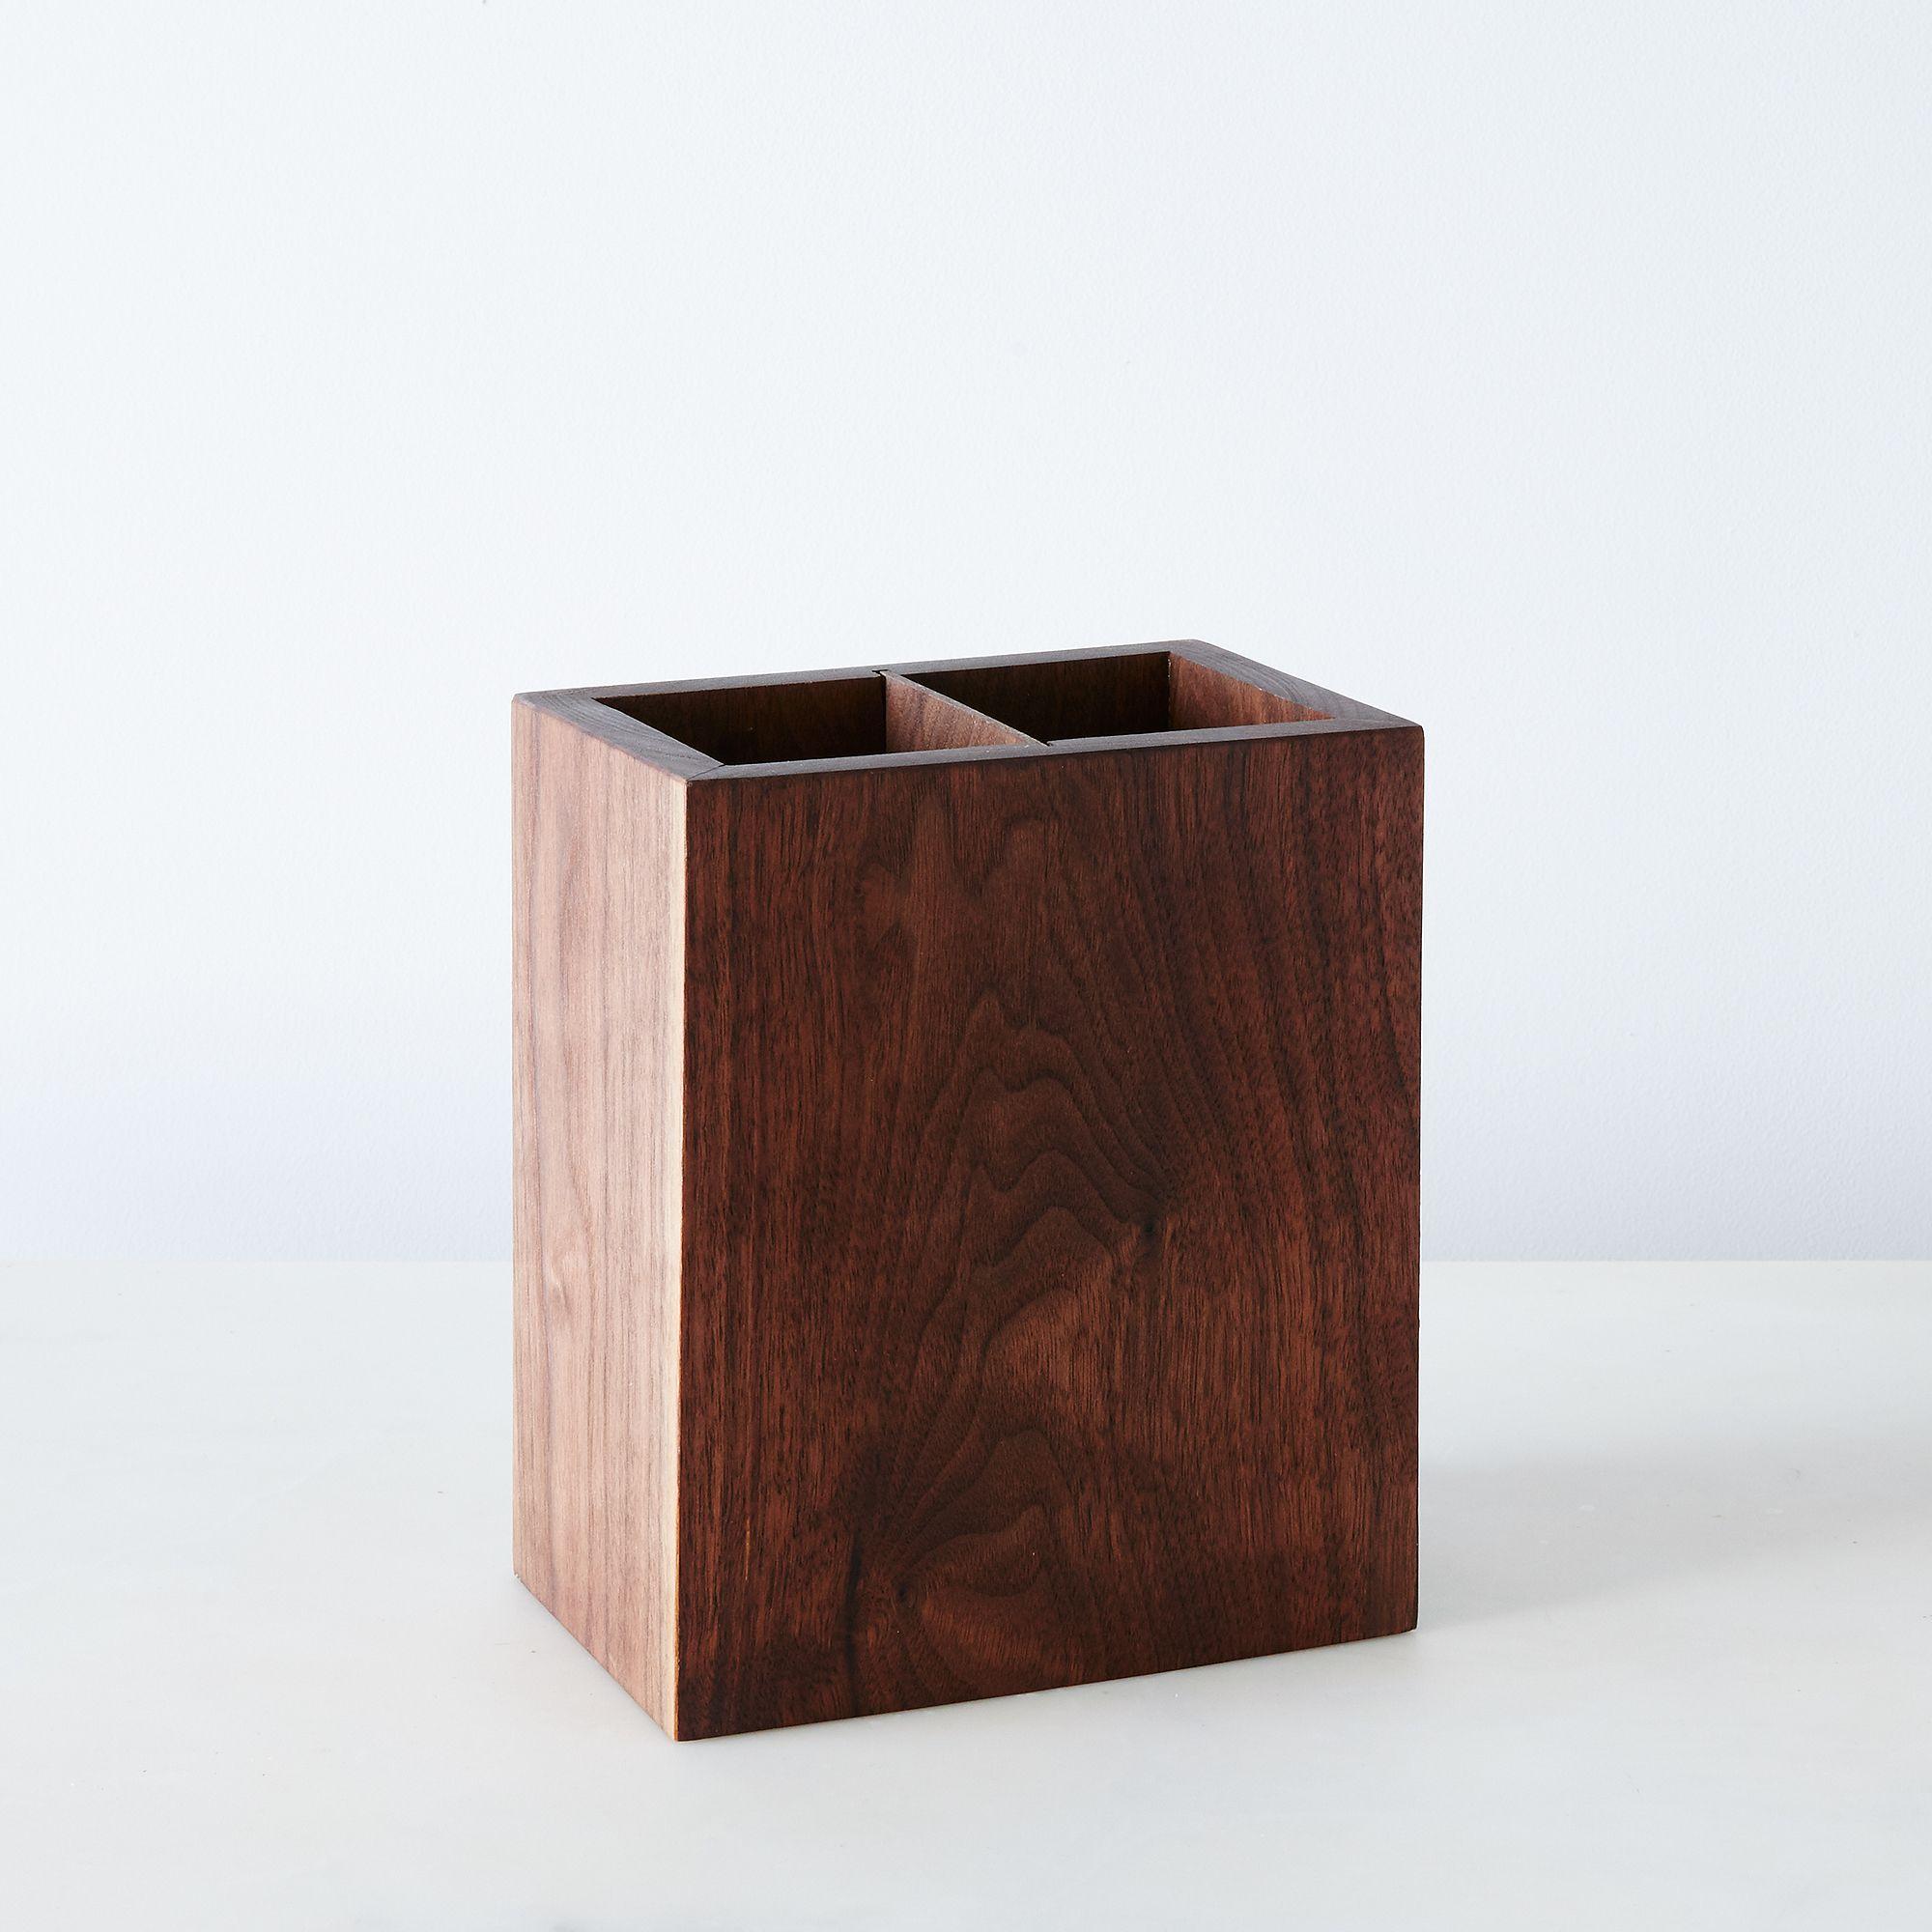 Wooden kitchen utensil holder - Walnut Kitchen Utensil Holder